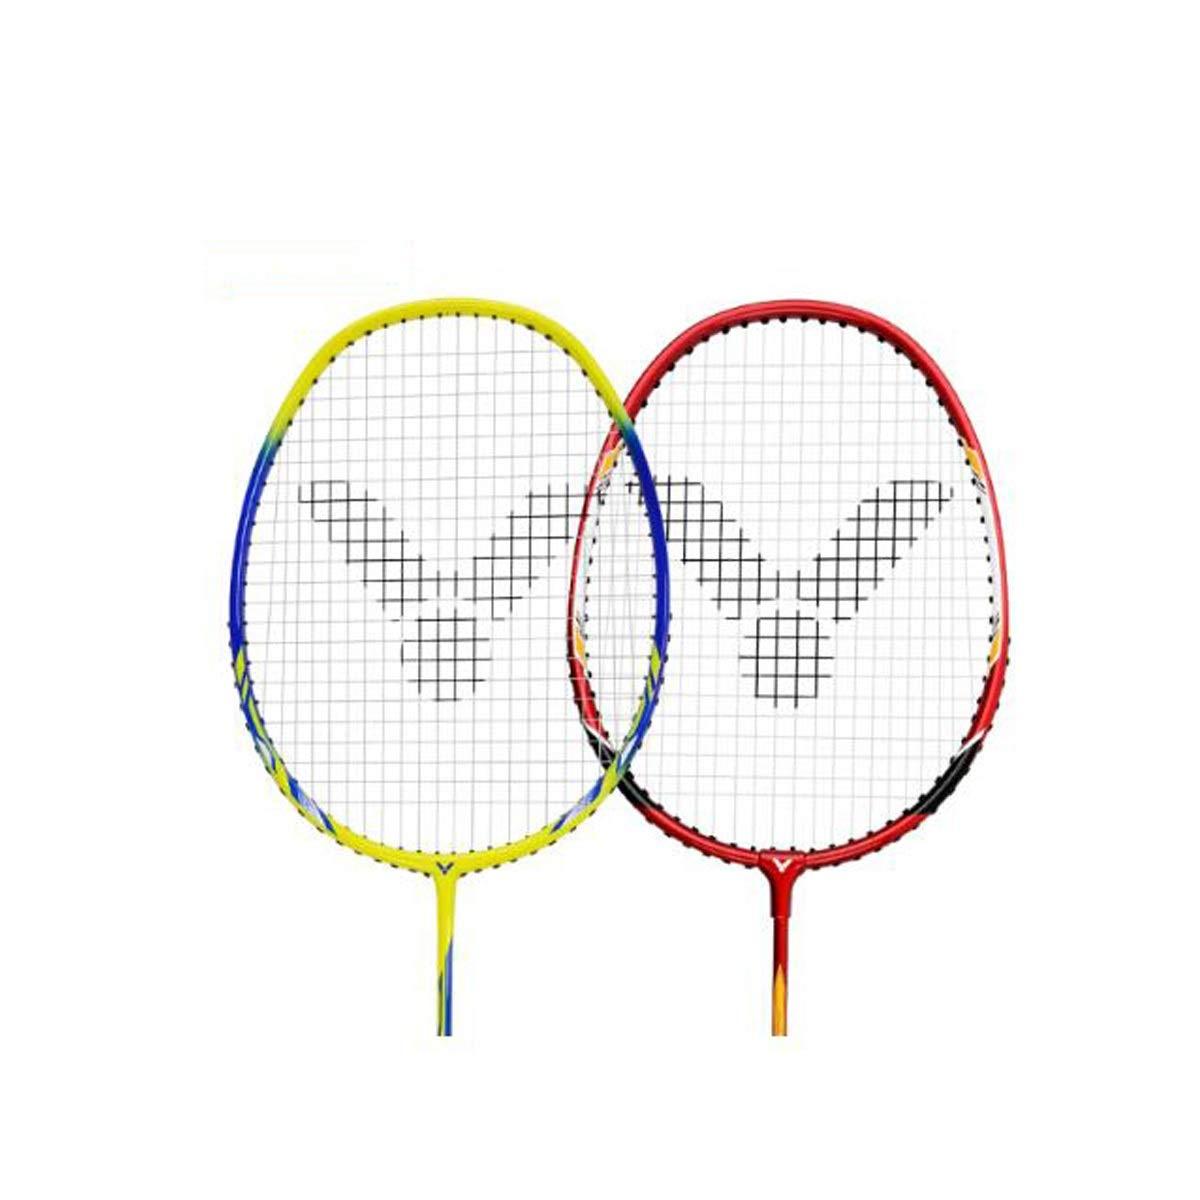 Tongboshi Badminton Racket, Double Shot, Offensive Full Carbon Badminton Racket, Aluminum Alloy Badminton Racket Badminton Racket, (Edition : C) by Tongboshi (Image #2)